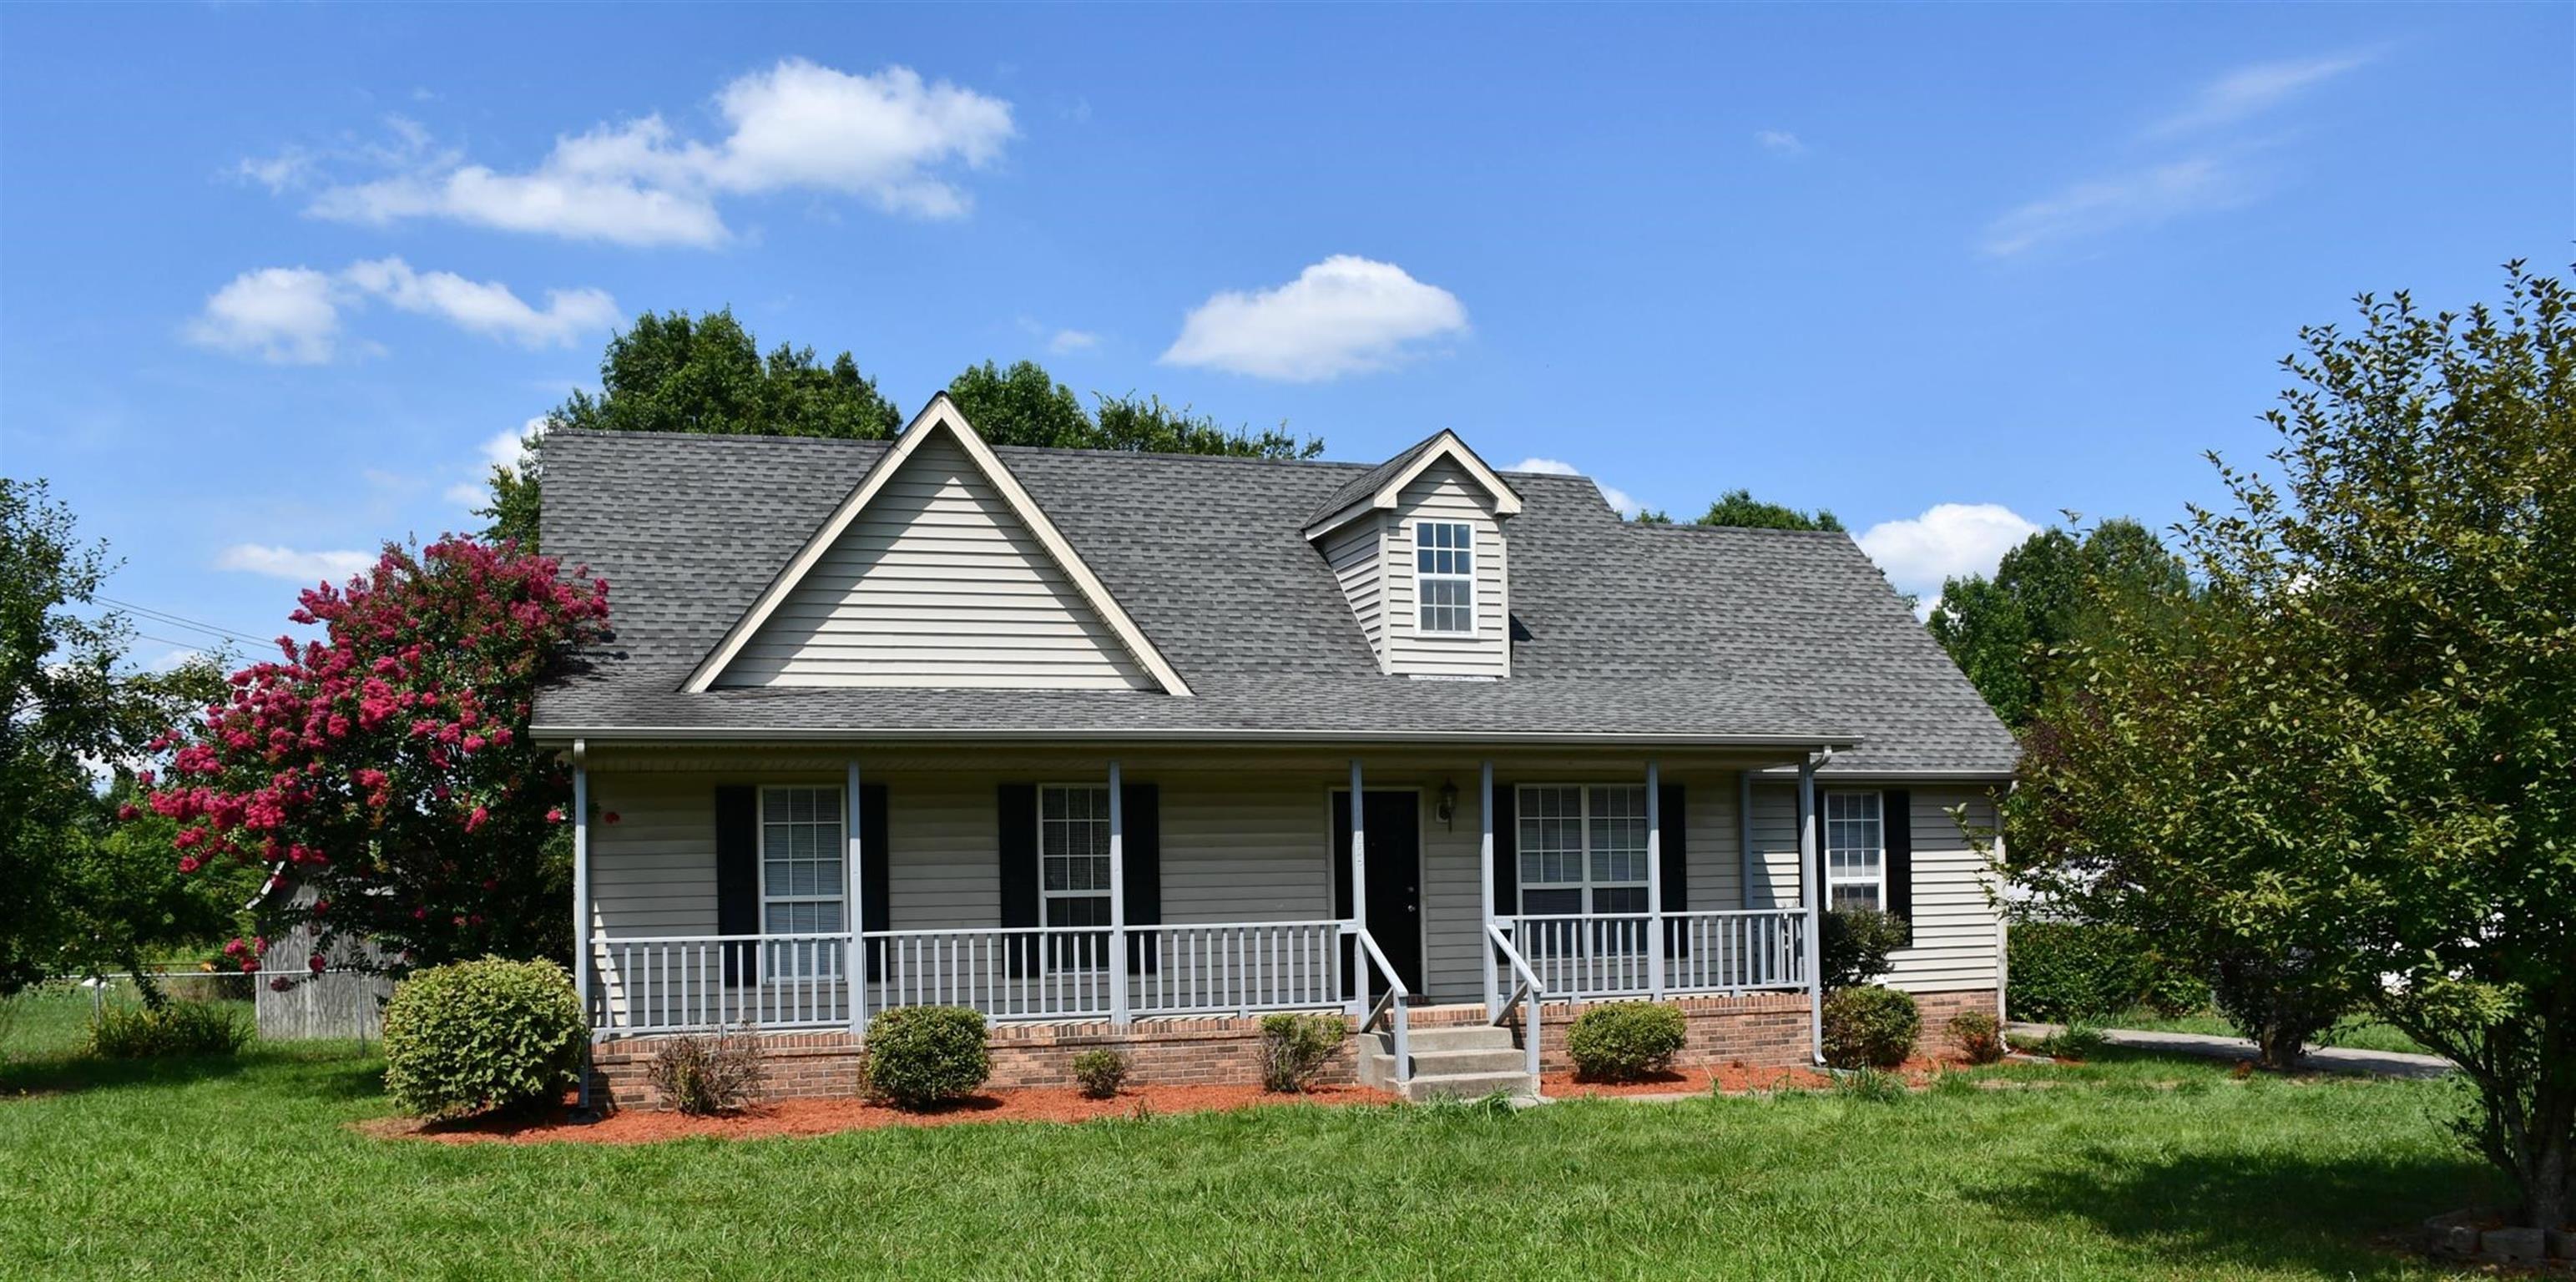 2965 Mike Ct, Woodlawn, TN 37191 - Woodlawn, TN real estate listing